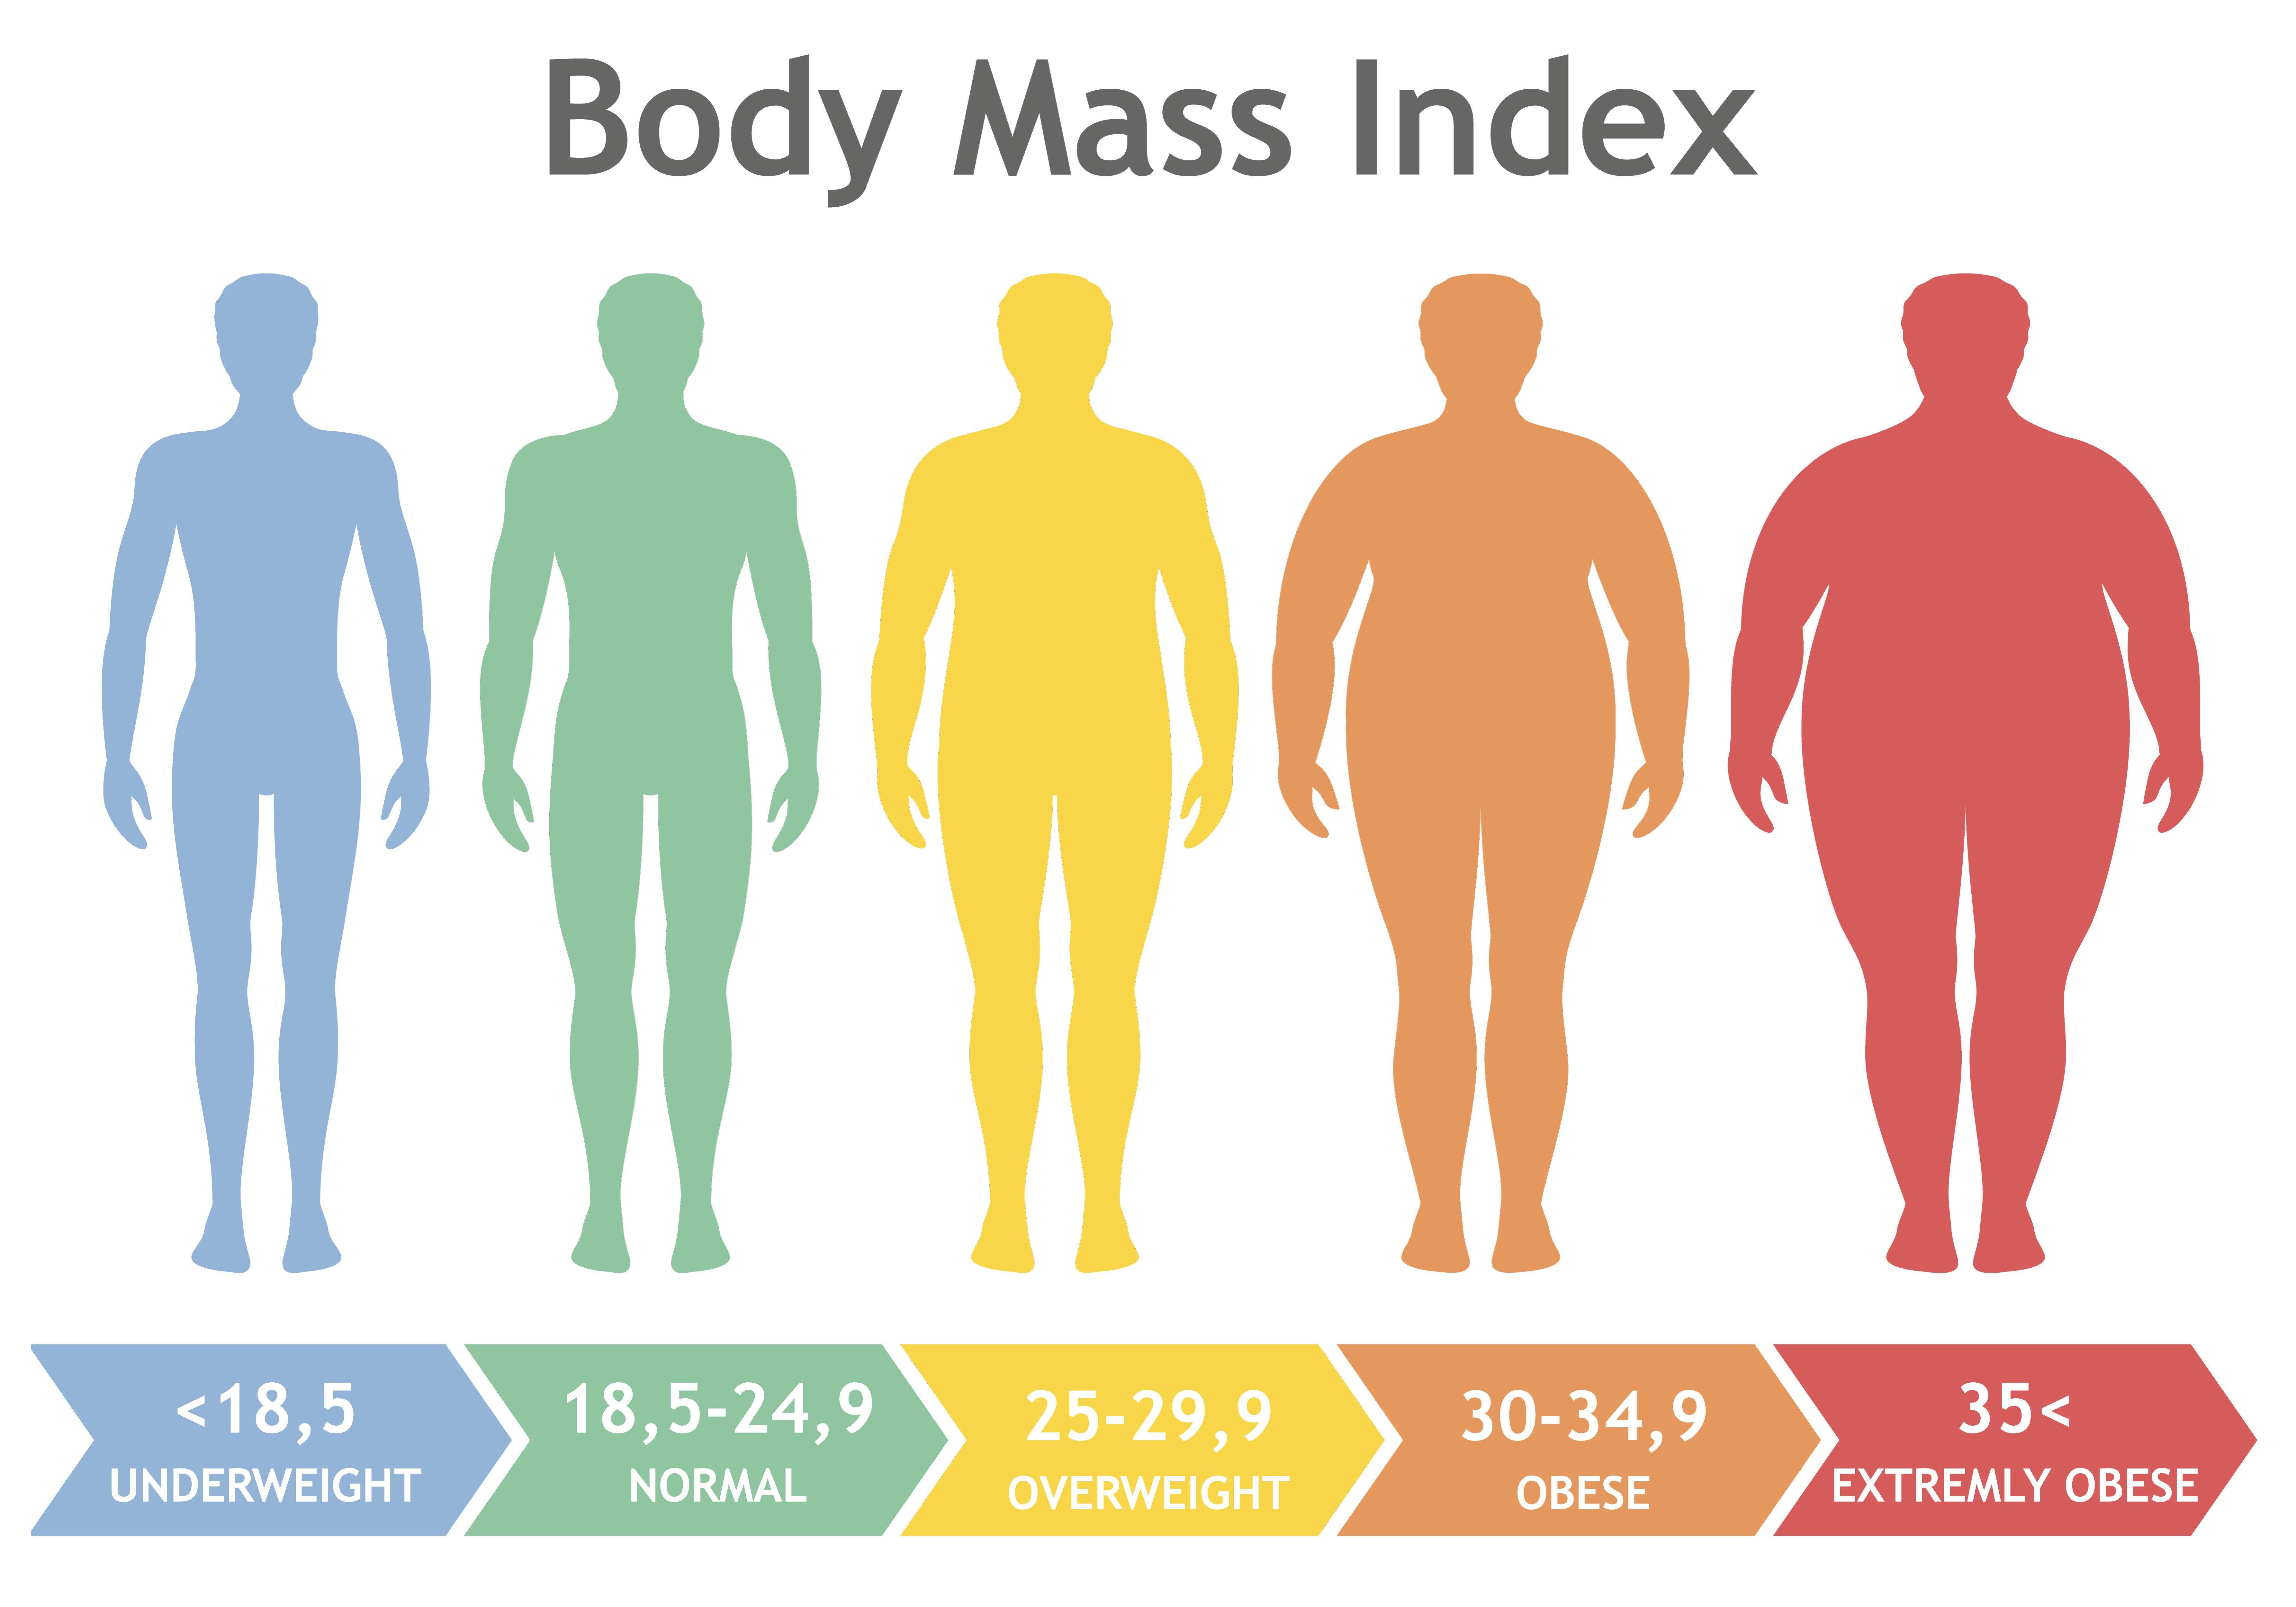 BMI : Body Mass Index